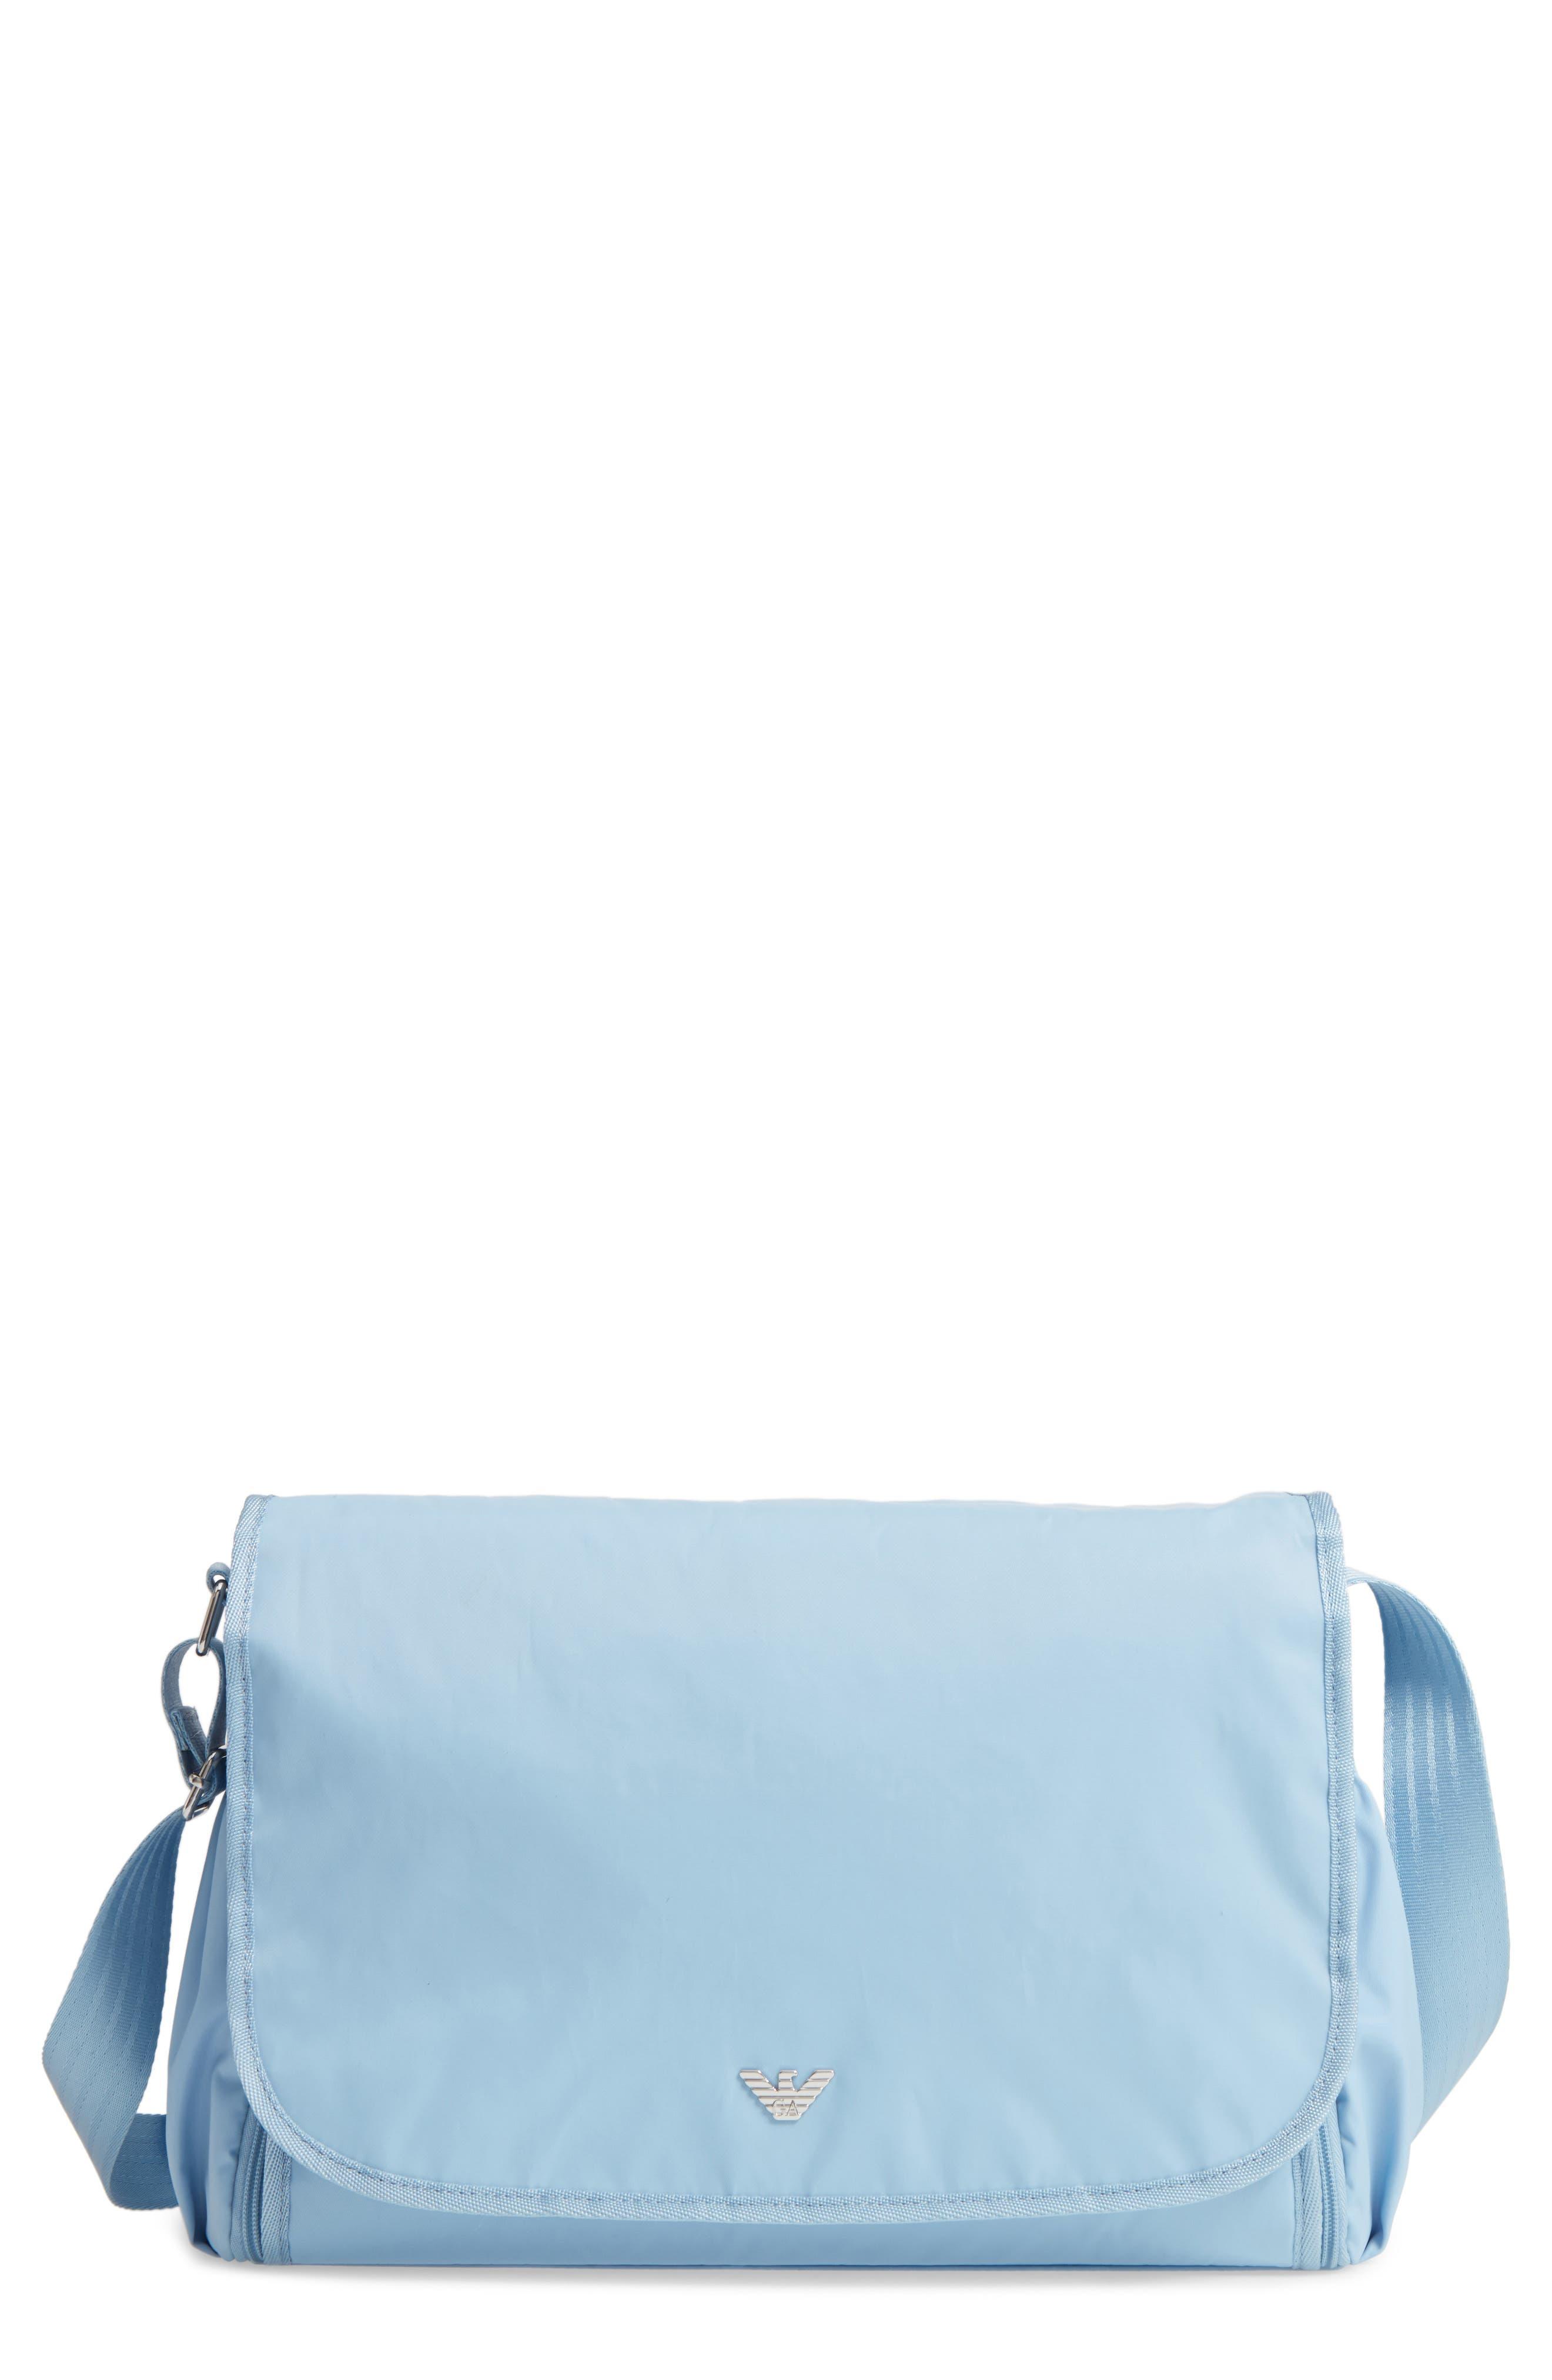 Nylon Messenger Diaper Bag,                             Main thumbnail 1, color,                             Light Blue